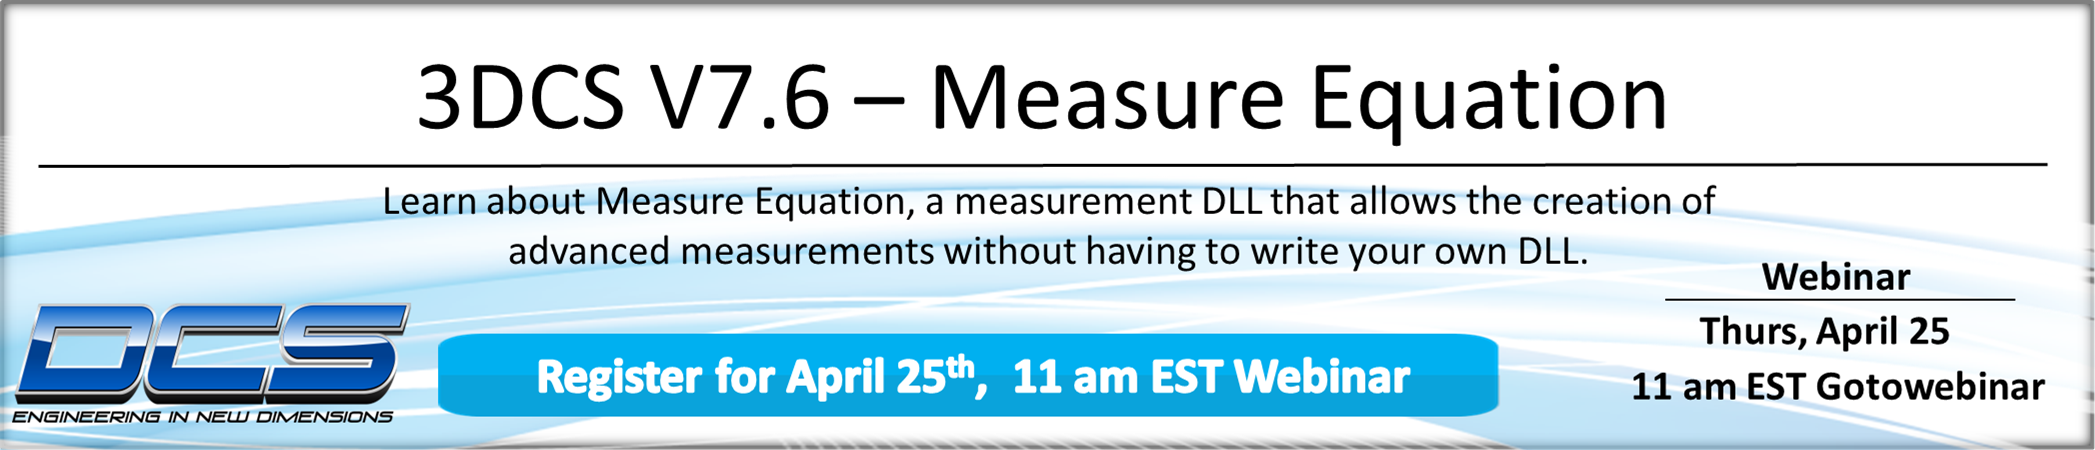 3DCS Measure Equation - Custom Measurements